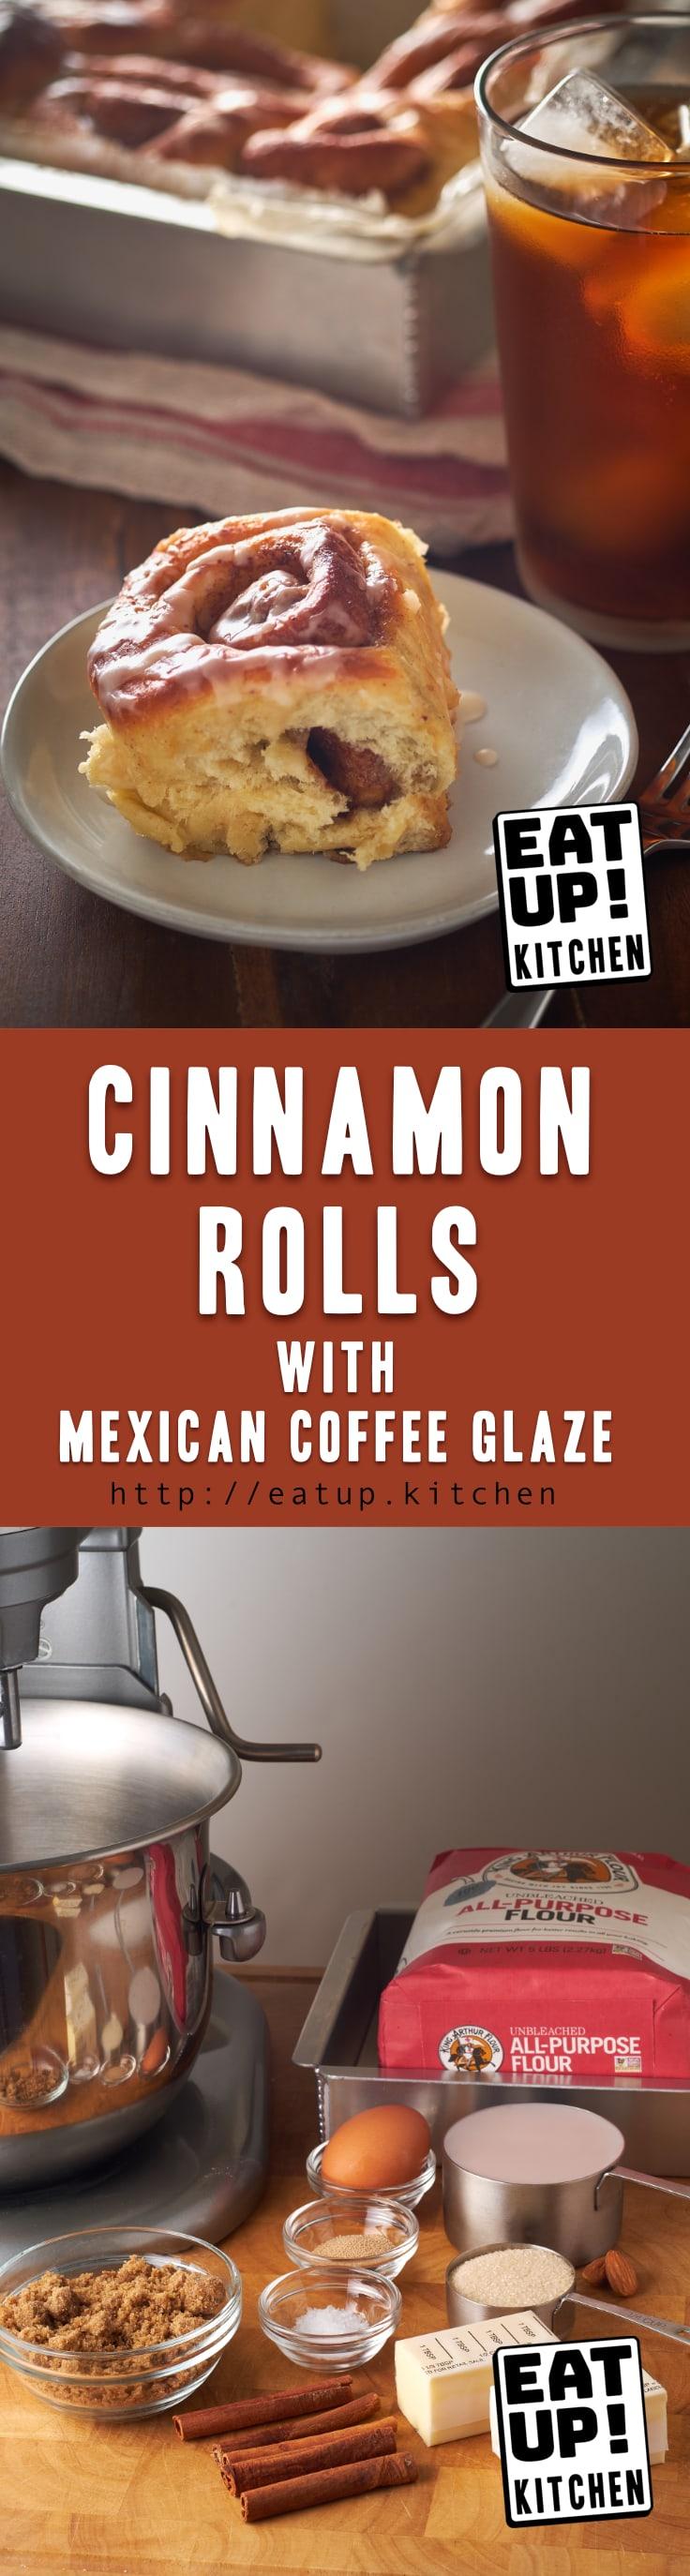 Cinnamon Rolls with Mexican Coffee Glaze